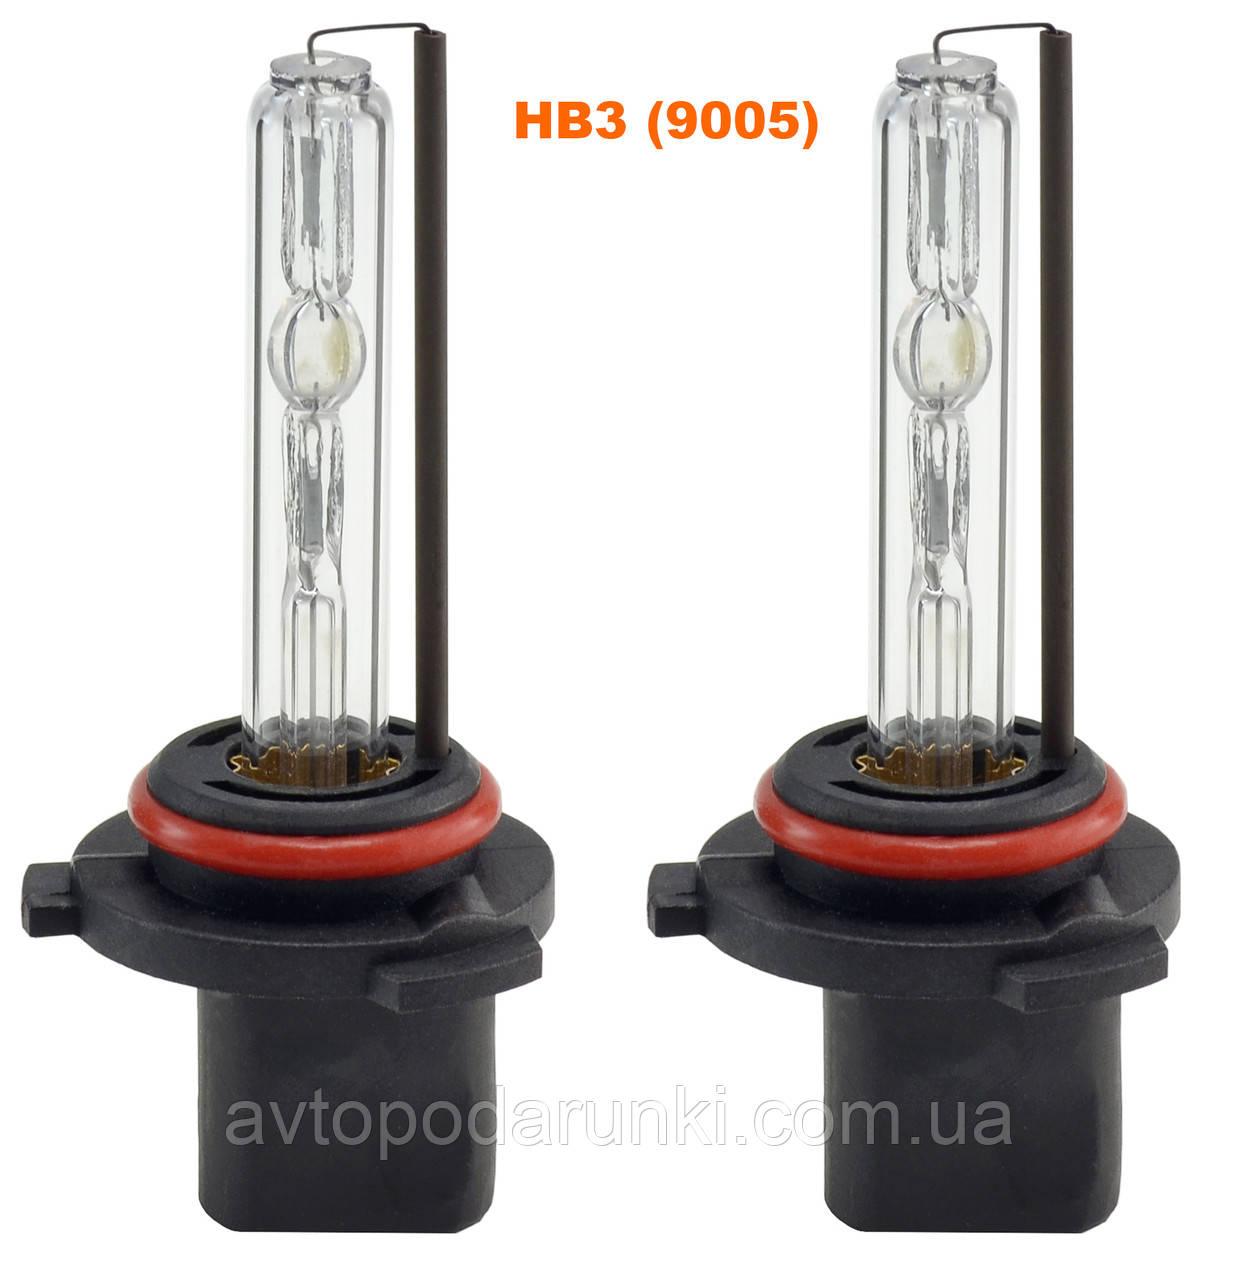 Ксеноновая лампа PREMIUM, лампа ксенон HB3 (9005)  5000K ( 35w, 12мес. гарантия ) / 2шт